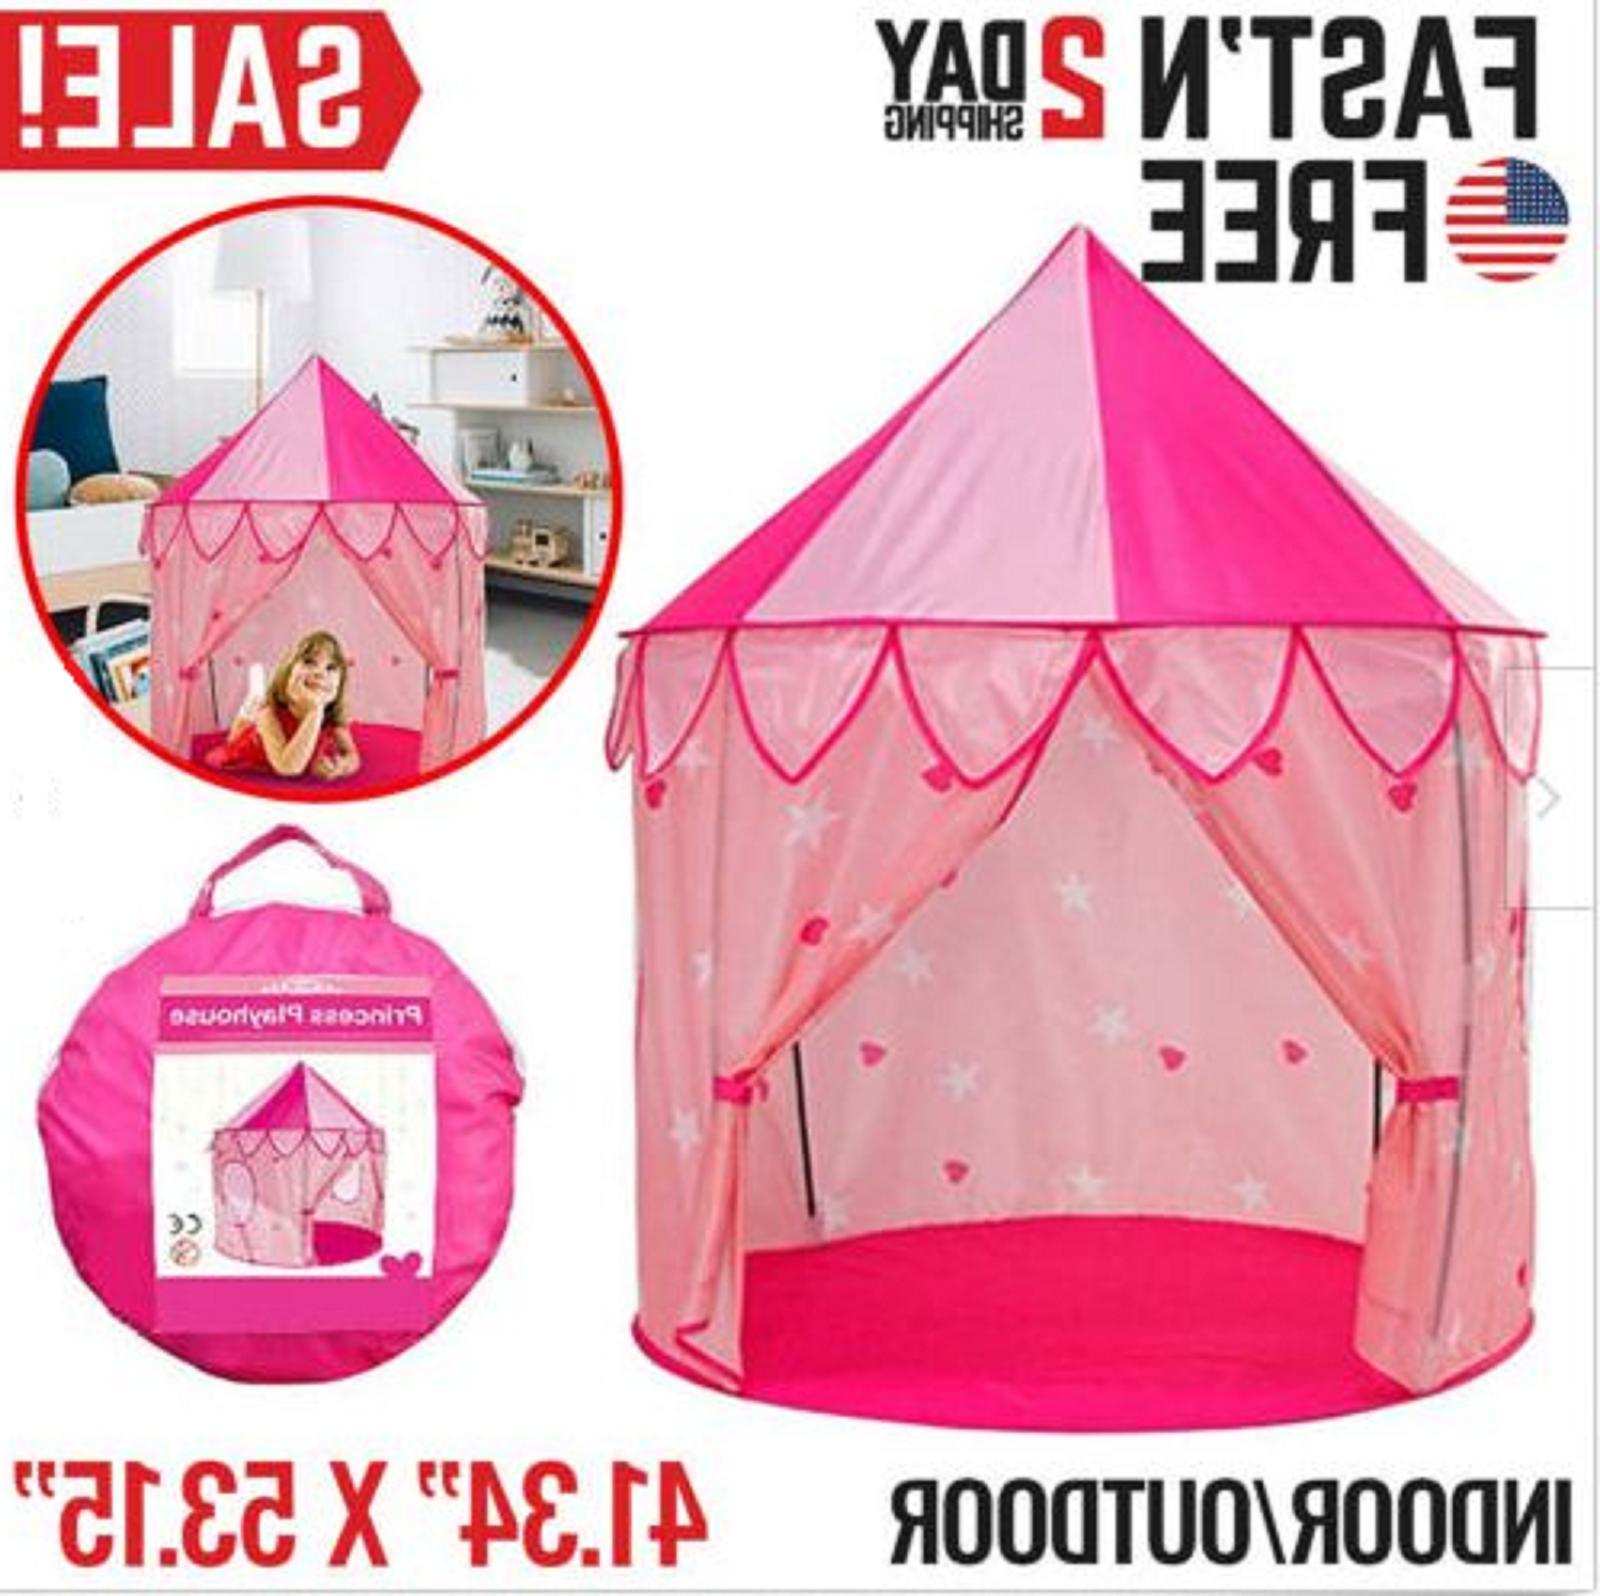 toys for girls kids children play tent